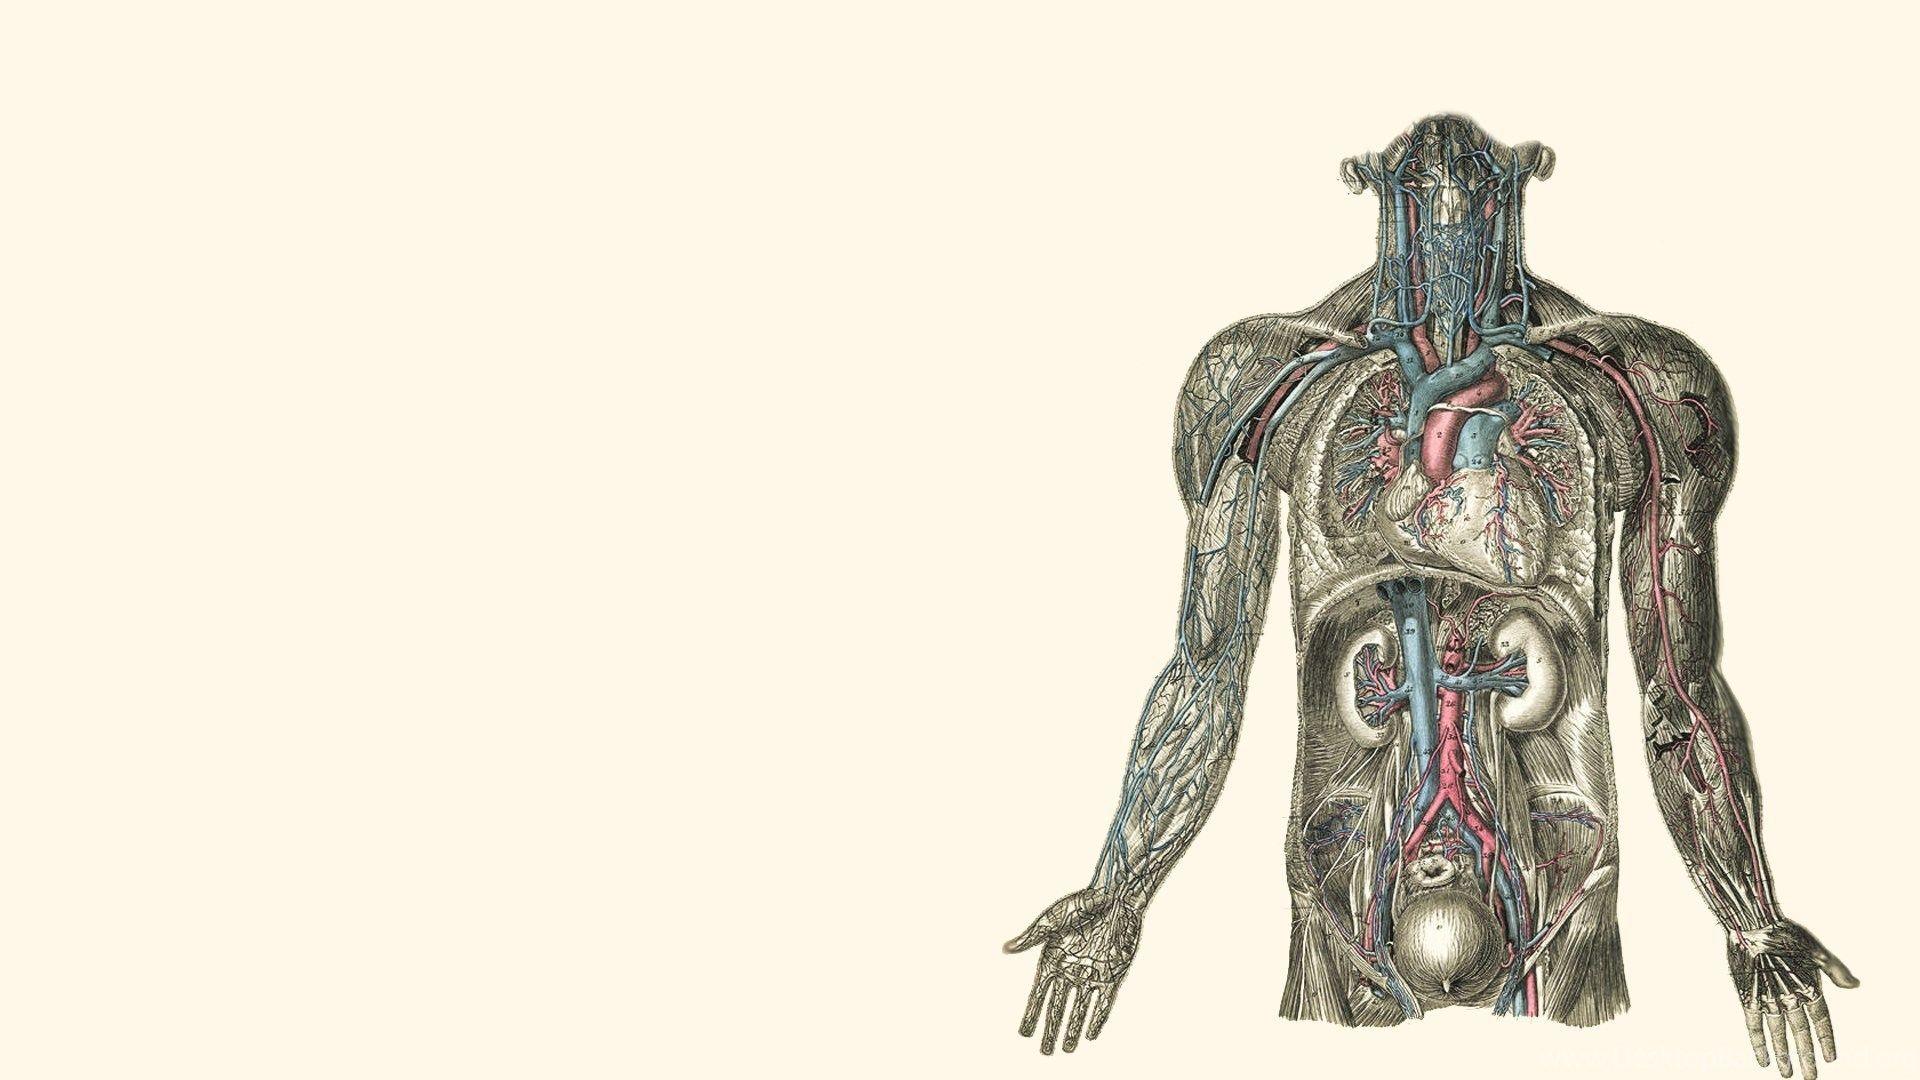 Human Muscle Cell Diagram Human Anatomy Study Human Body Anatomy